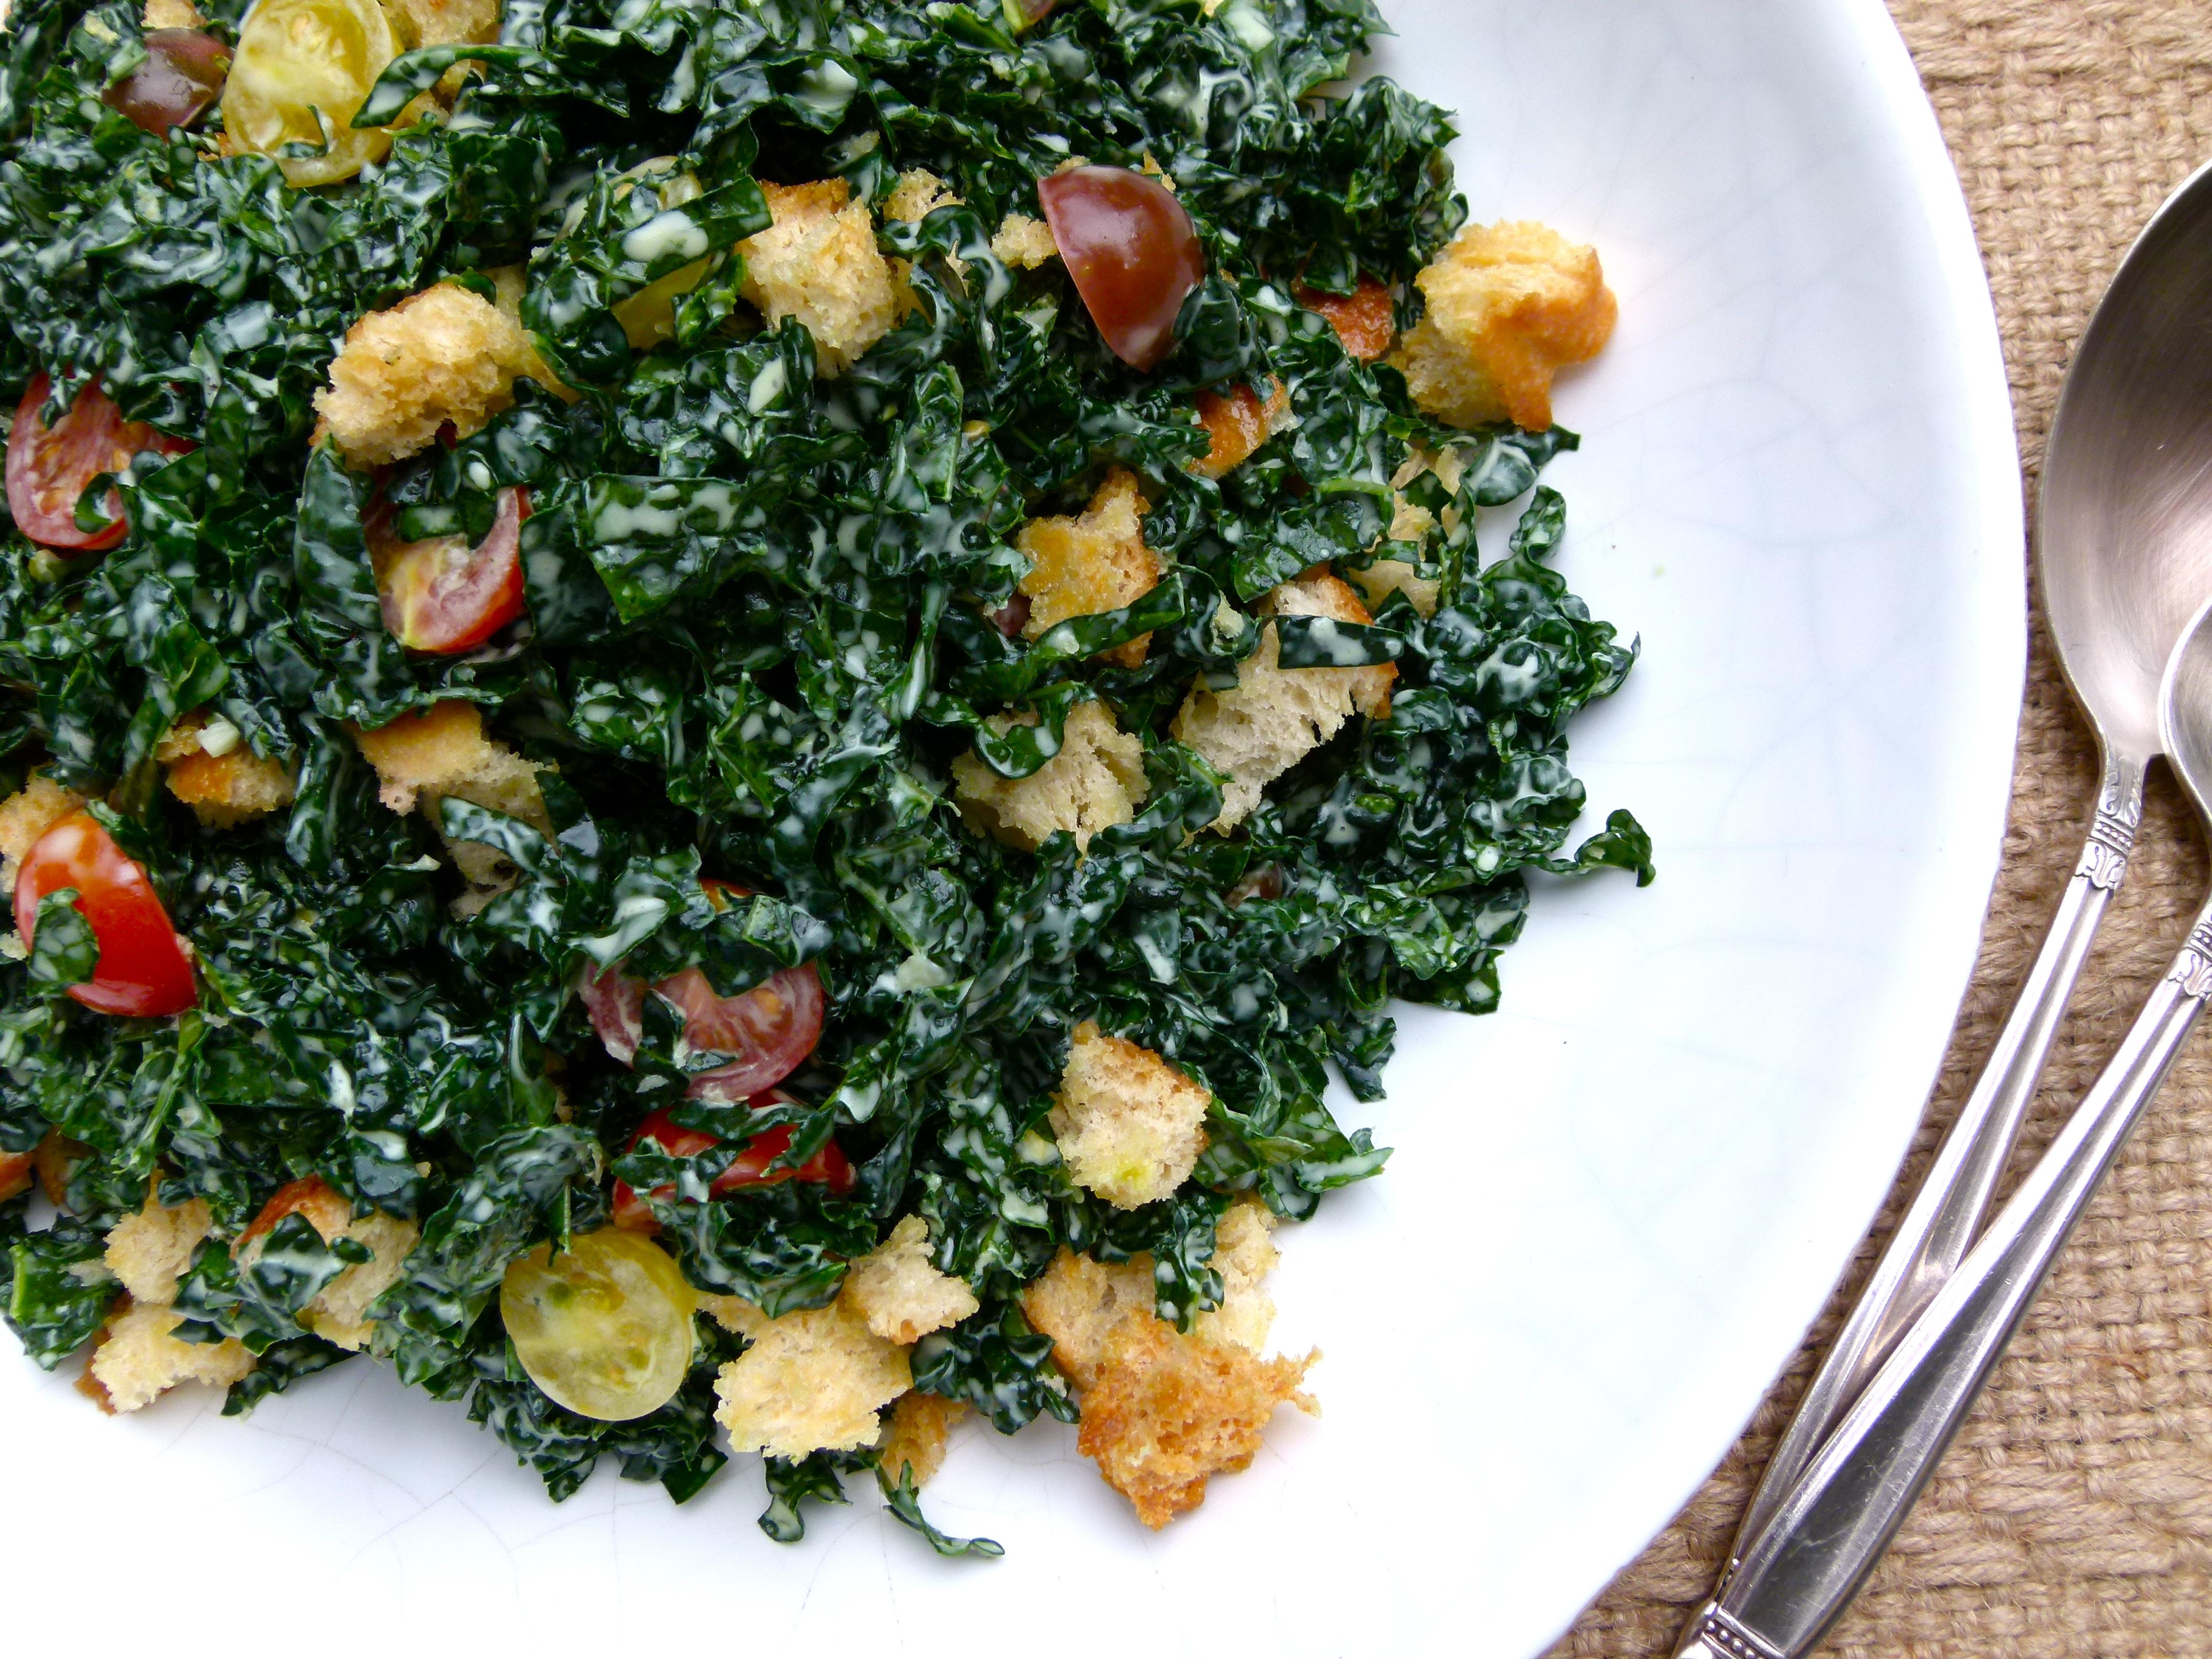 kale salad with creamy lemon dressing (dairy-free recipe) | Pamela ...